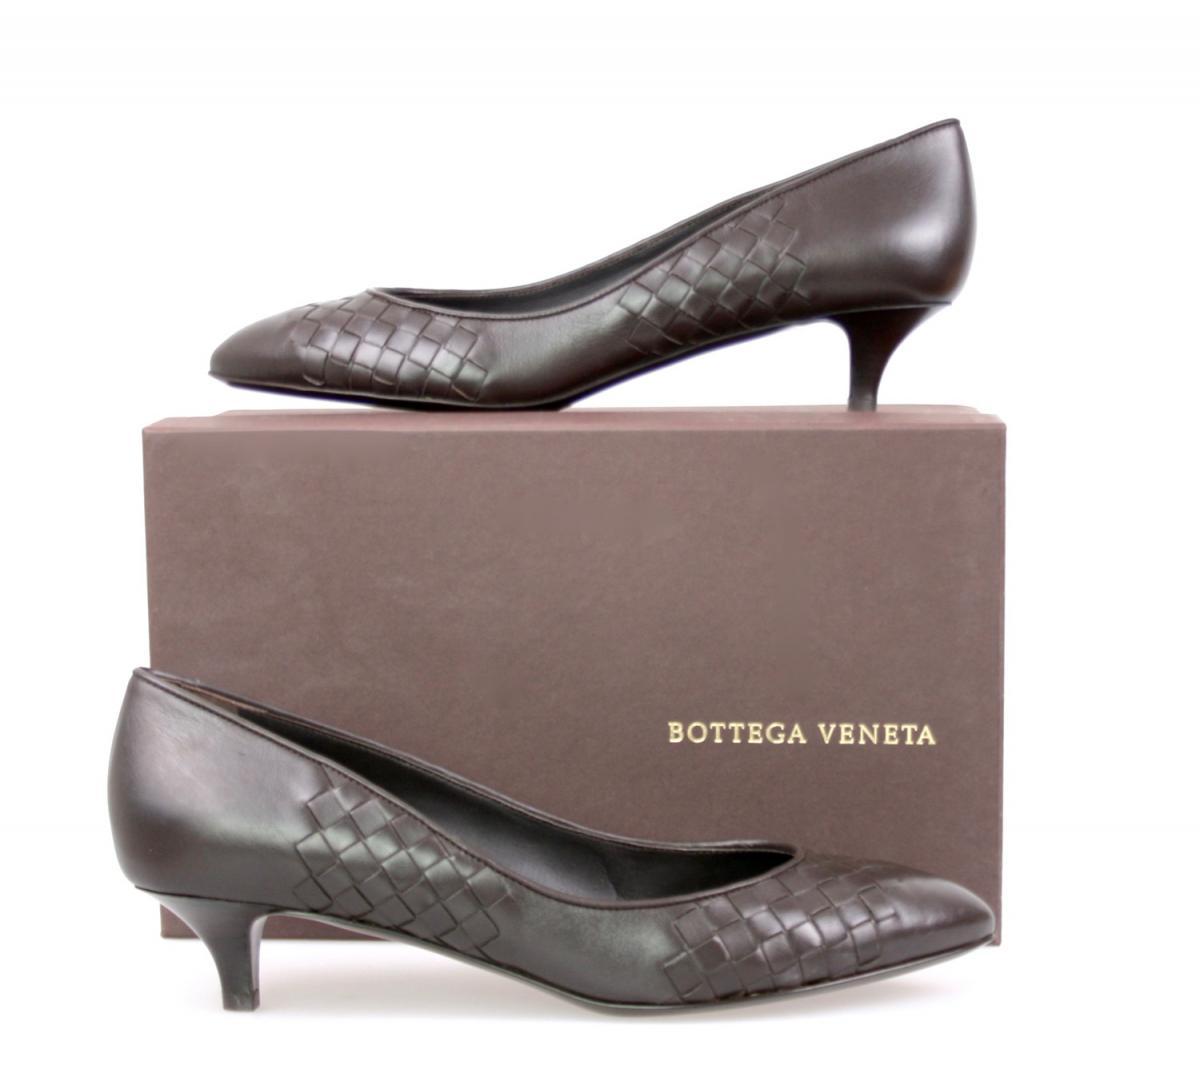 luxus bottega veneta pumps schuhe vk851 espresso neu new 40 40 5 uk 7 ebay. Black Bedroom Furniture Sets. Home Design Ideas